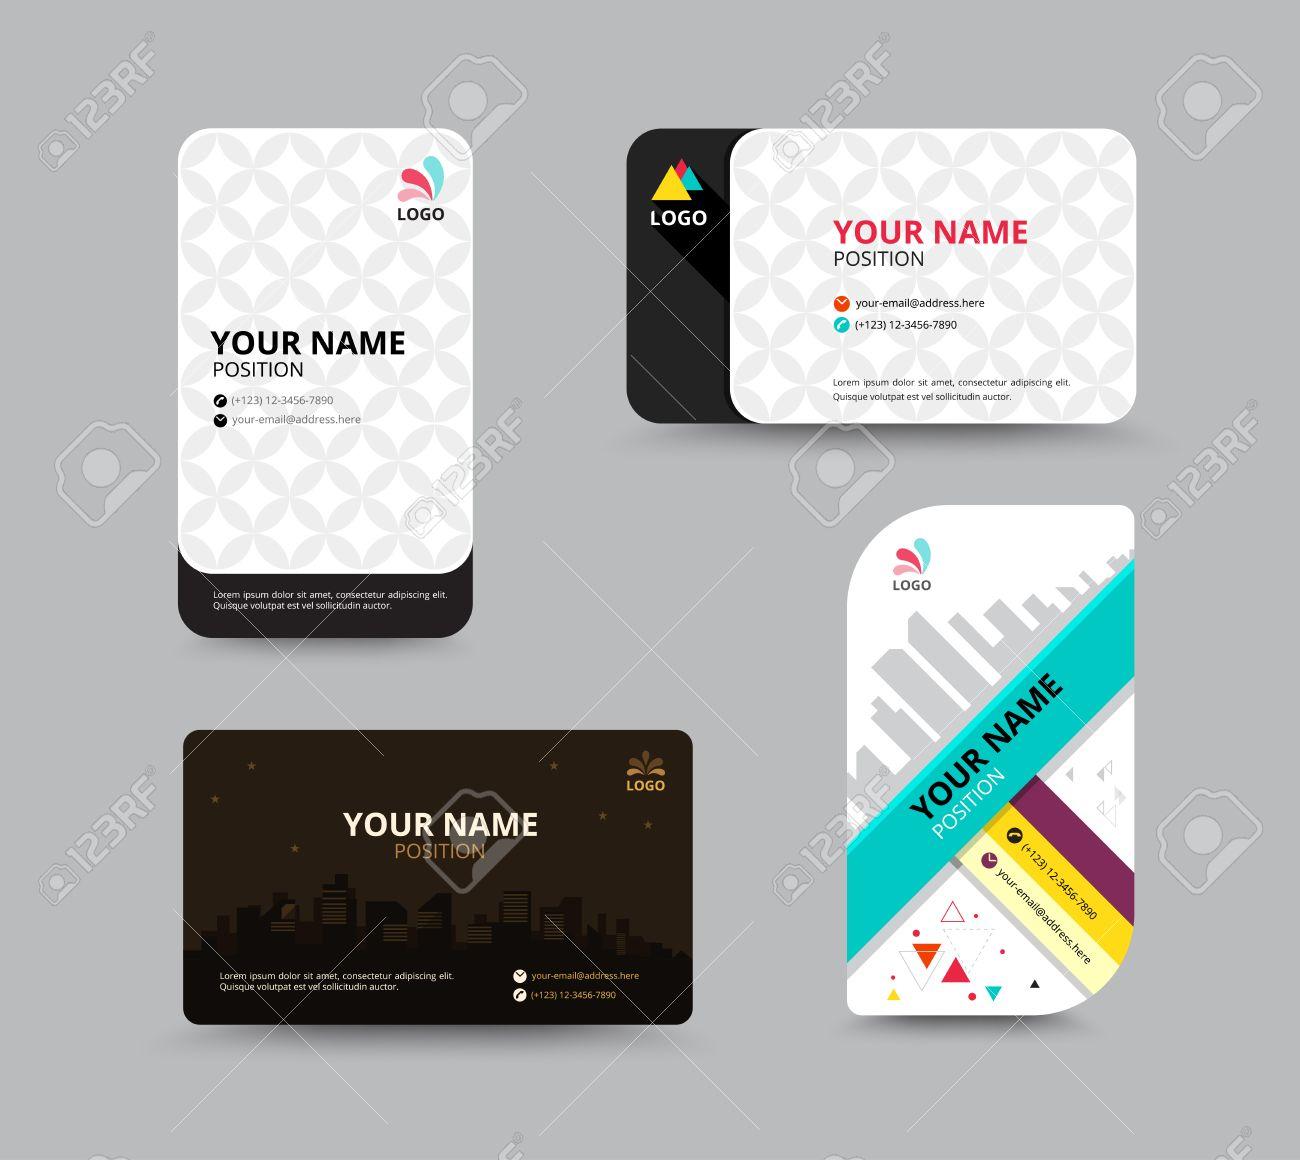 Contact card template business name card design set vector contact card template business name card design set vector illustration stock vector 41643903 flashek Choice Image